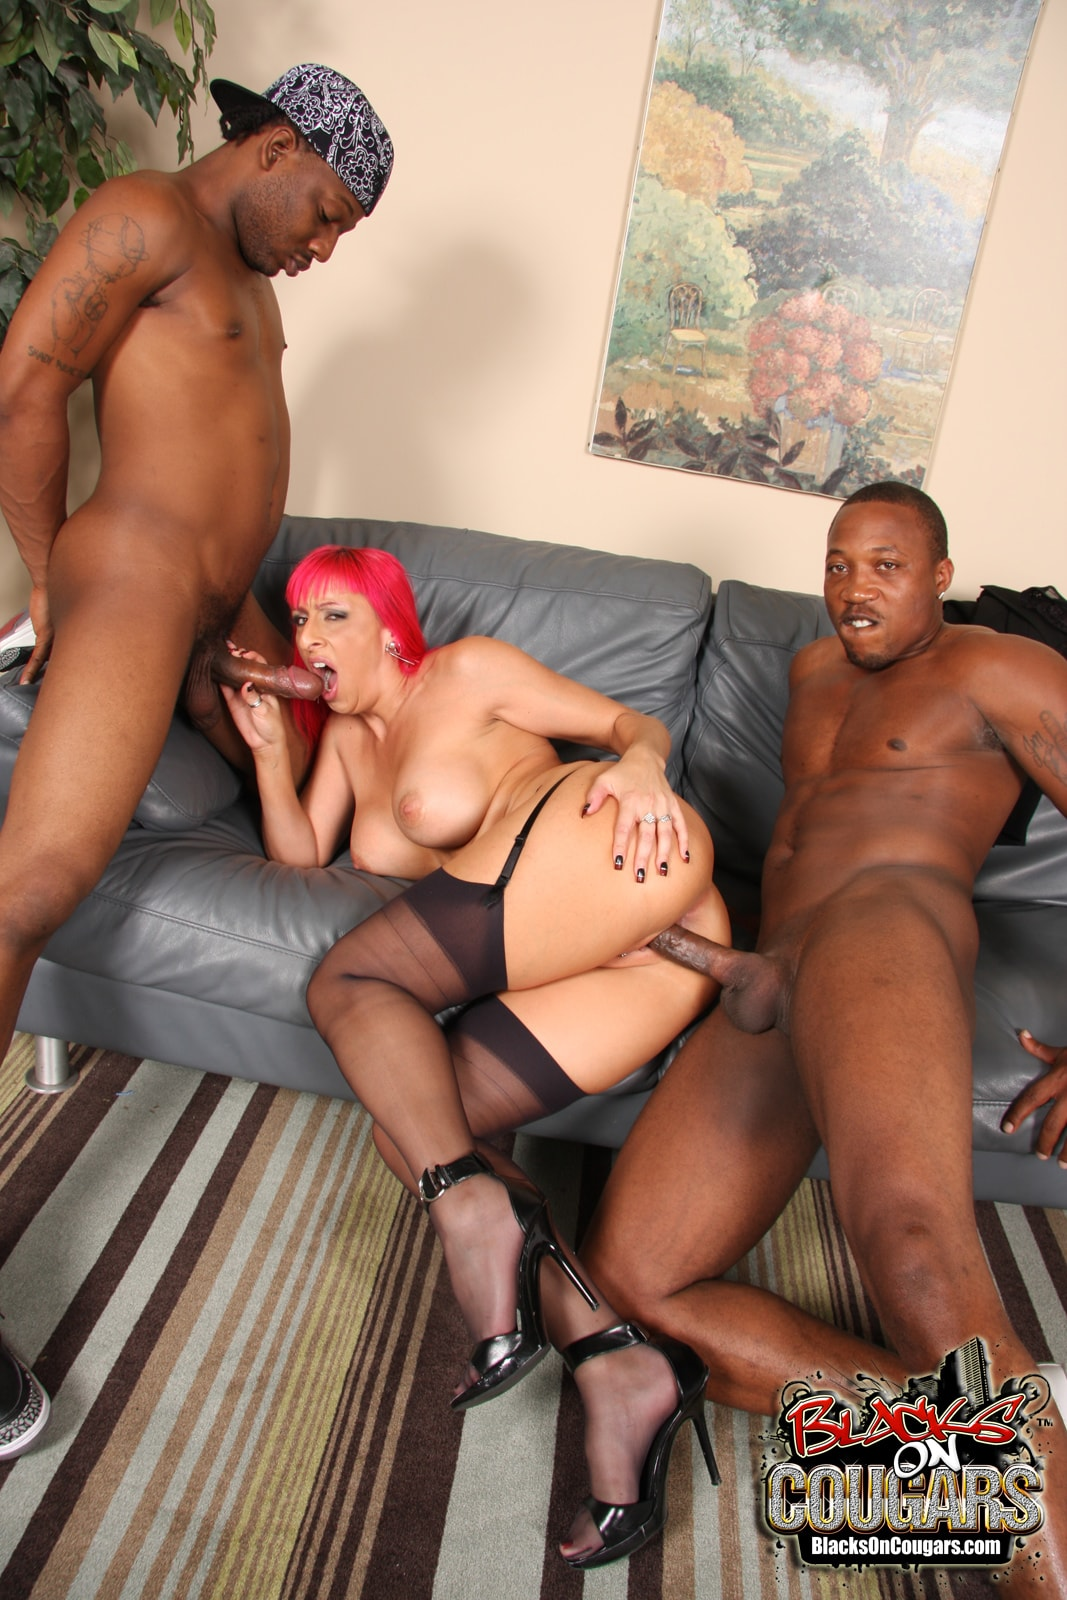 Dogfart '- Blacks On Cougars' starring Raven Black (Photo 27)